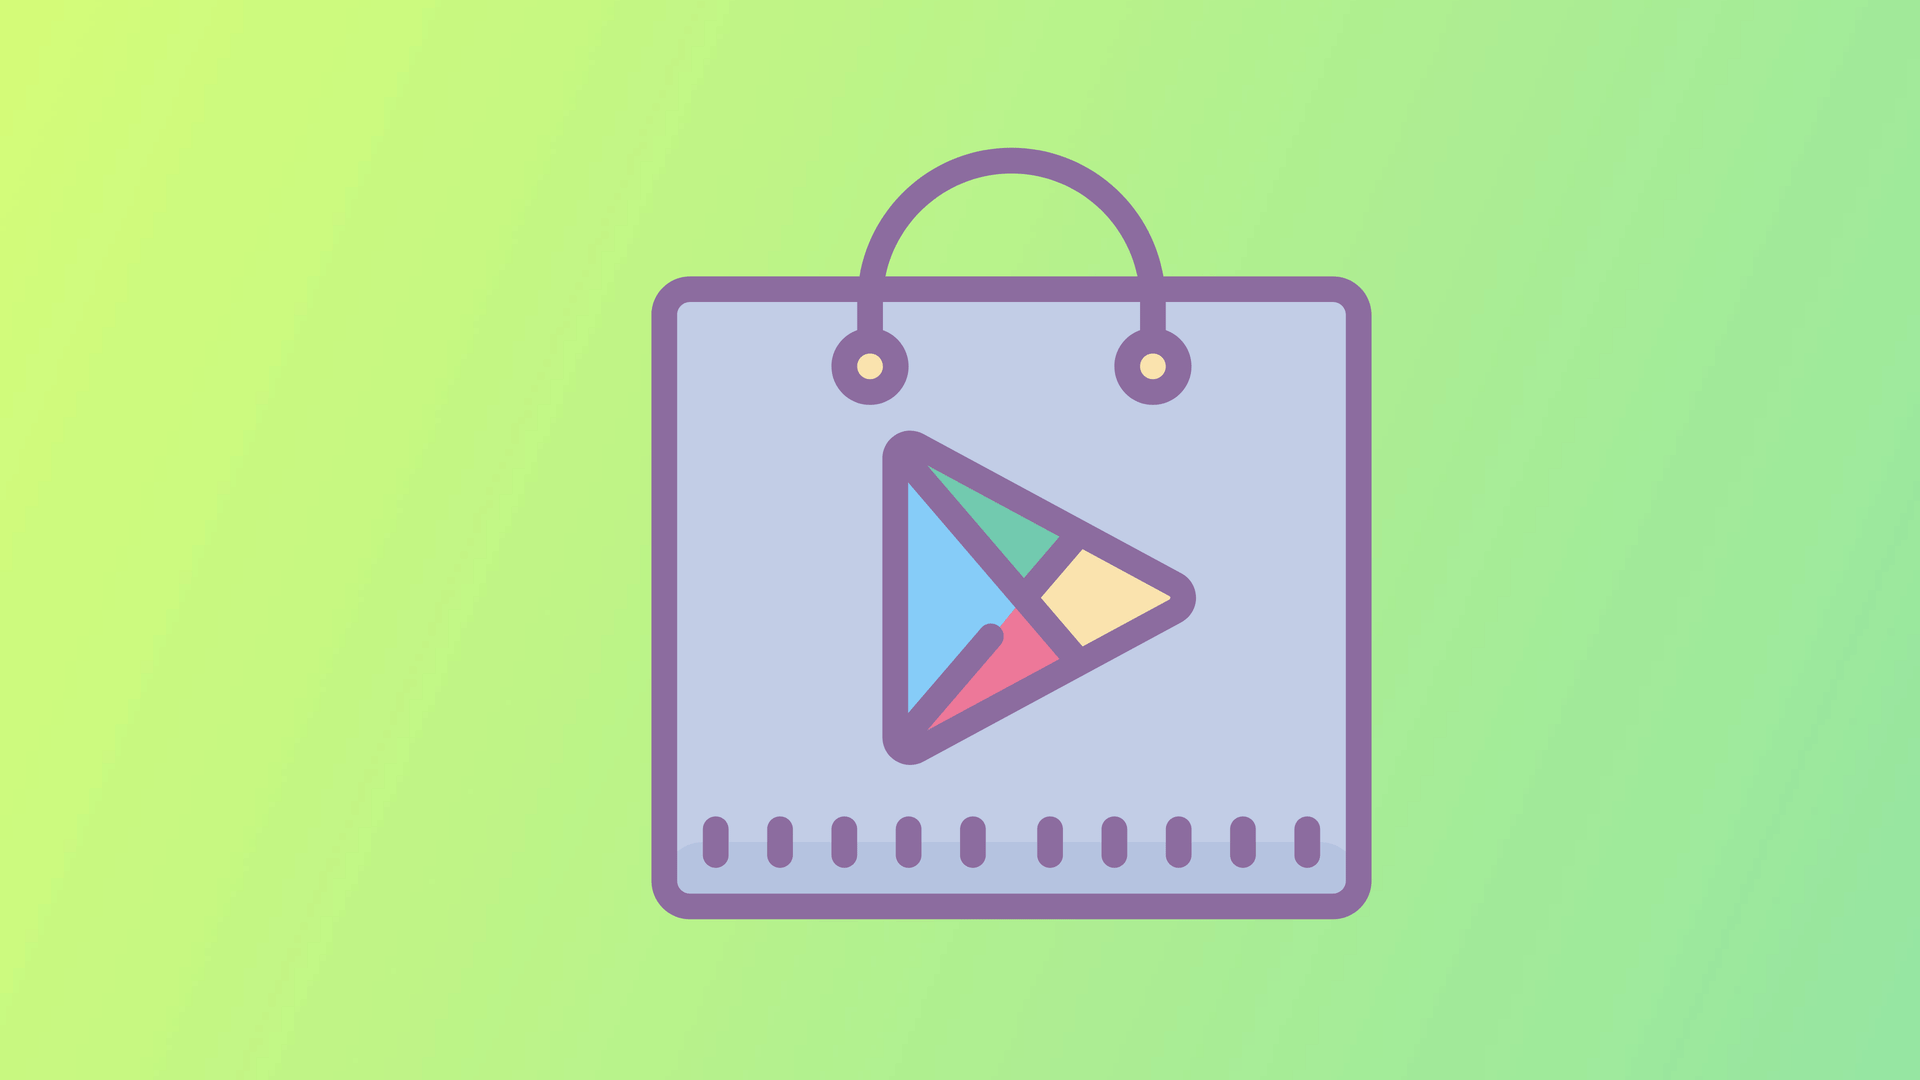 Fast 50 Adware Apps im Google Play Store enttarnt techboys.de • smarte News, auf den Punkt!